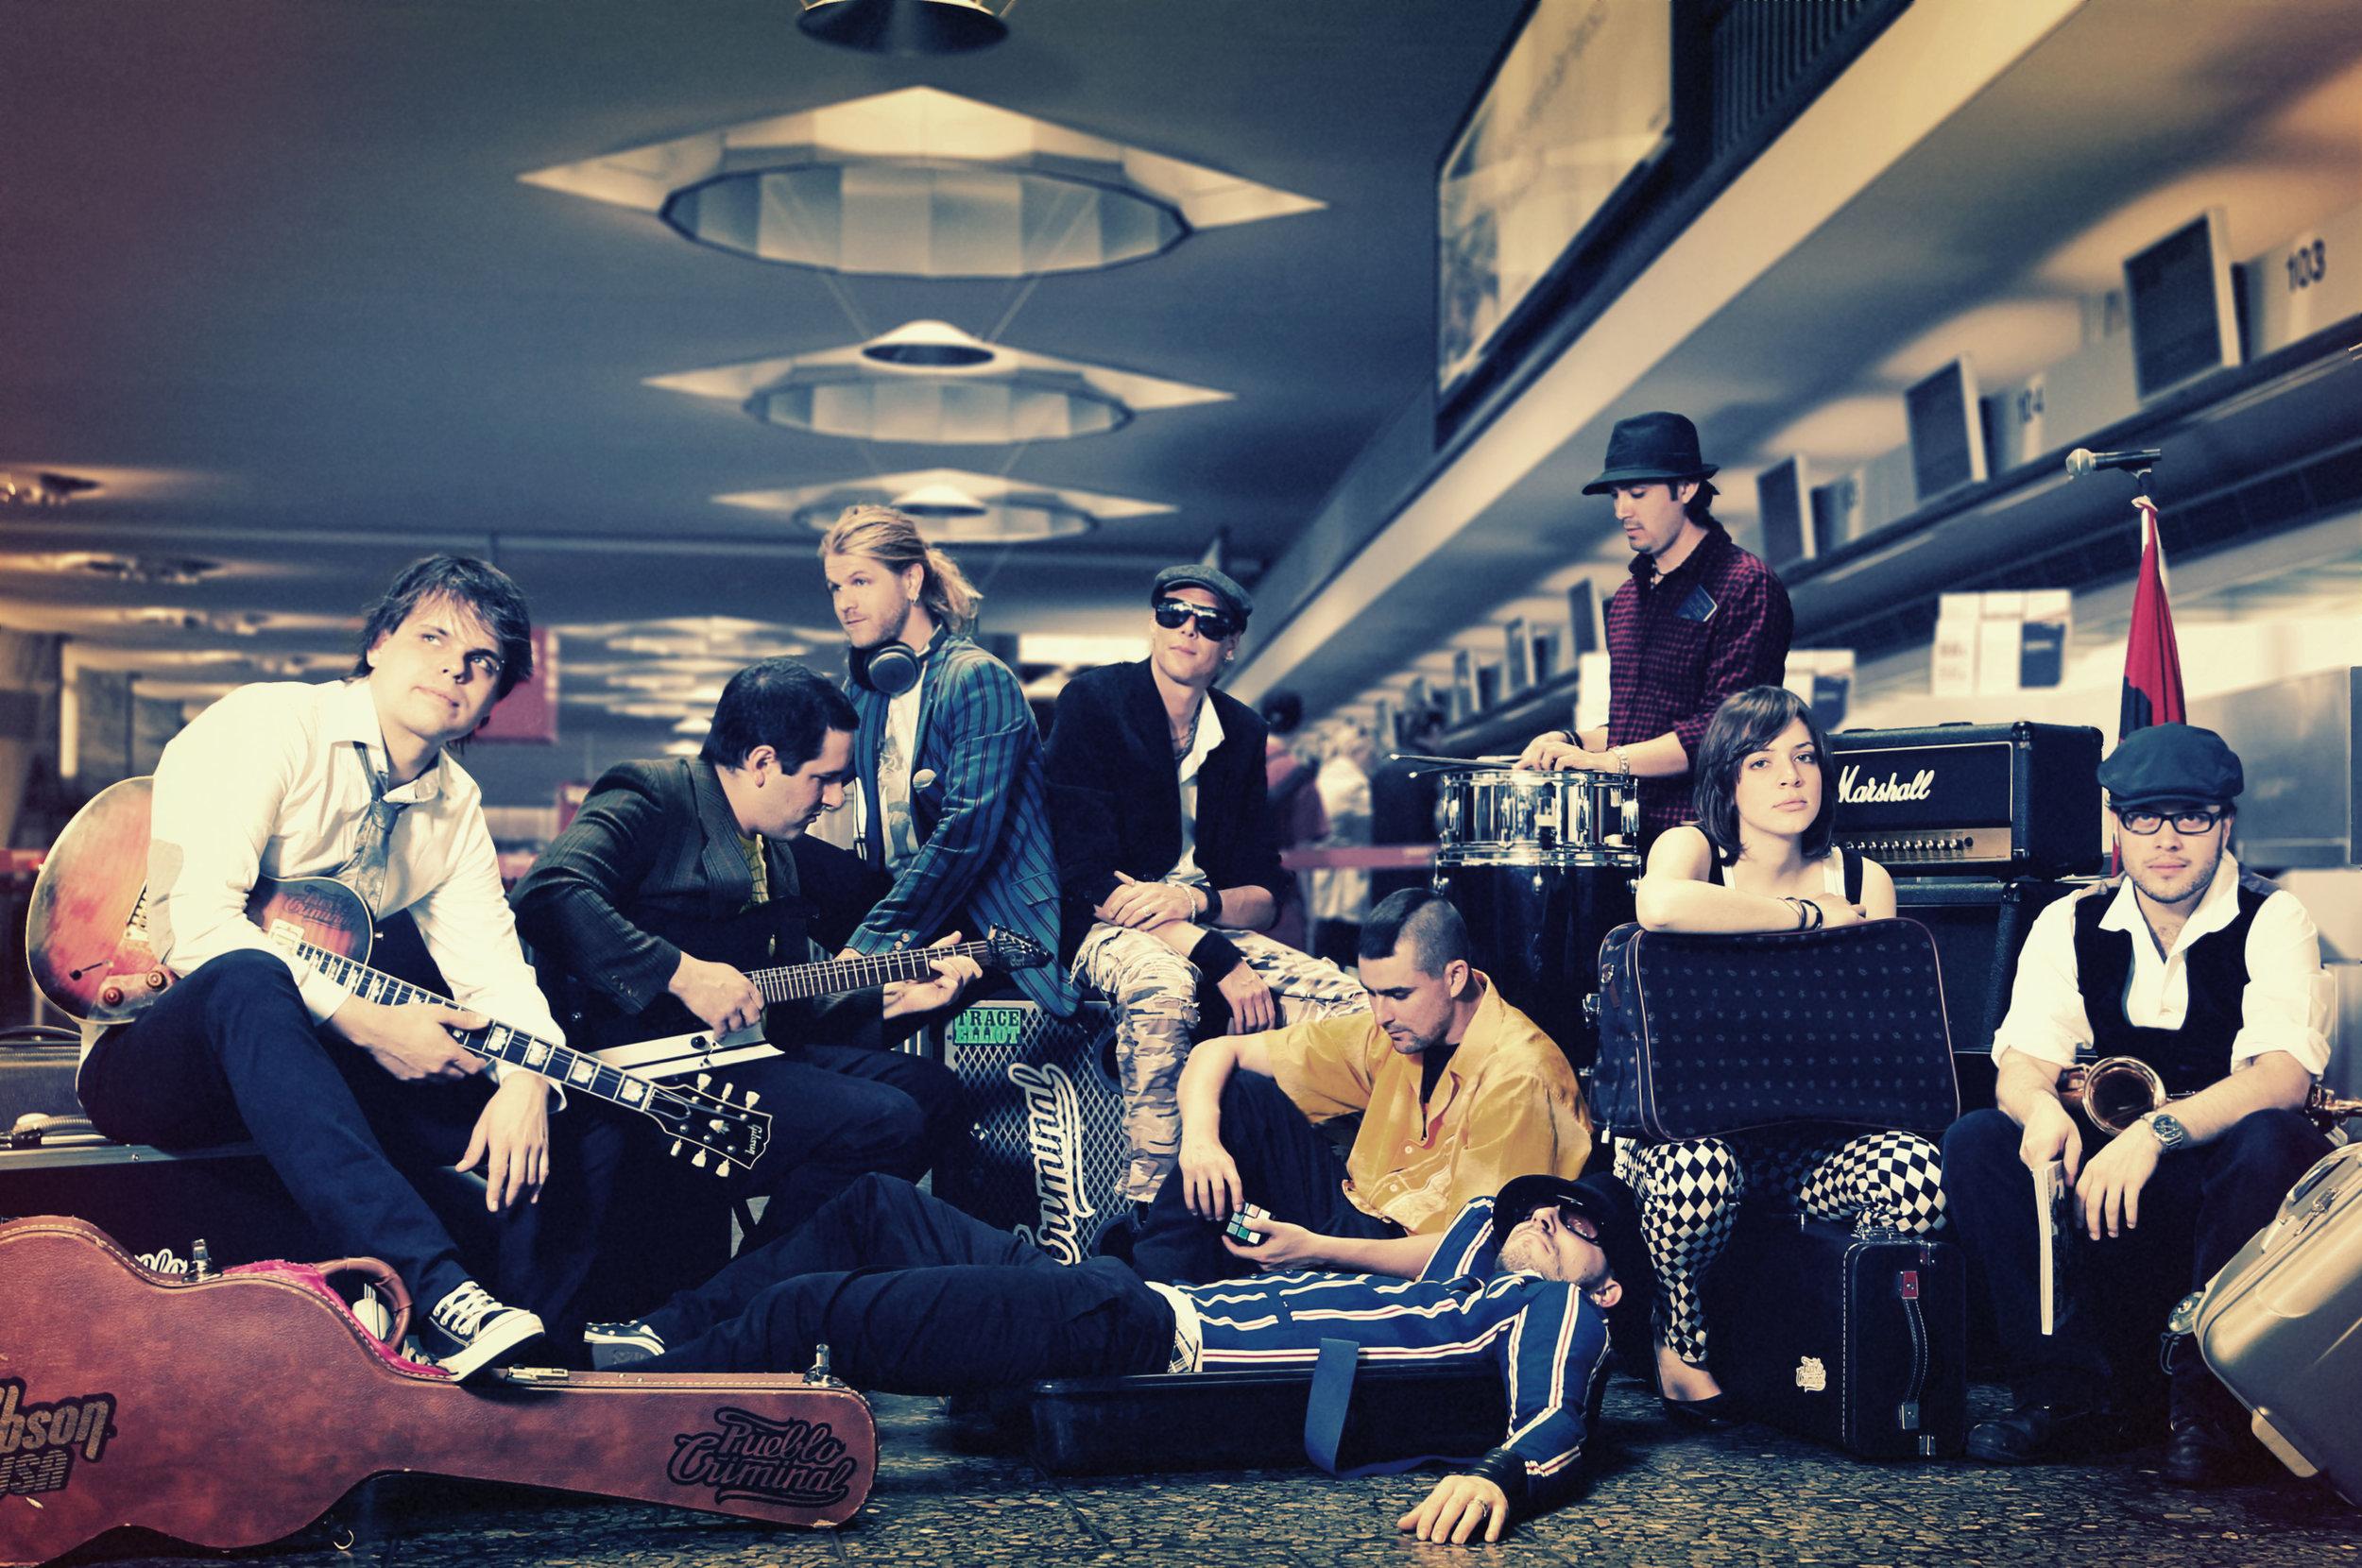 1 Band Photo Group Sitting - PUEBLO CRIMINAL